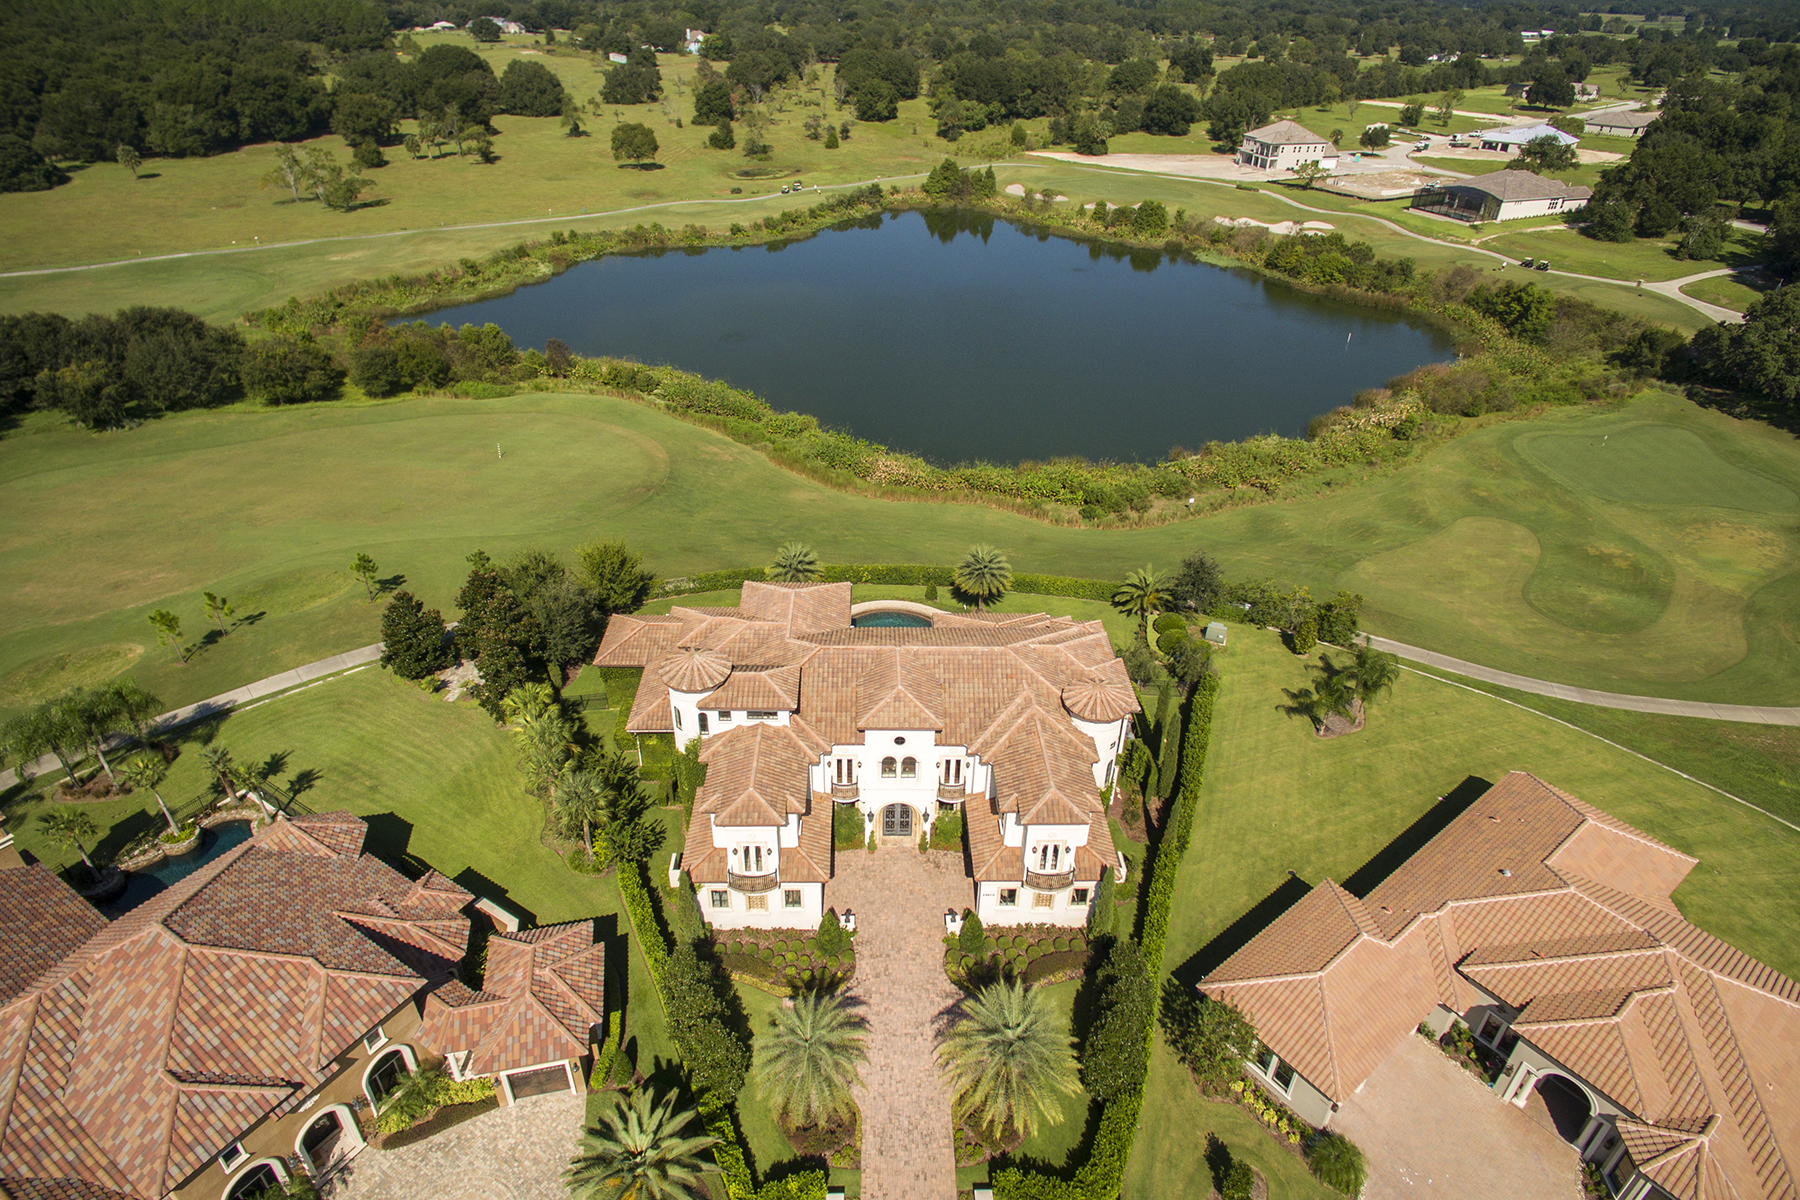 Single Family Home for Sale at ORLANDO - SORRENTO 25602 Grandview Pointe, Sorrento, Florida 32776 United States